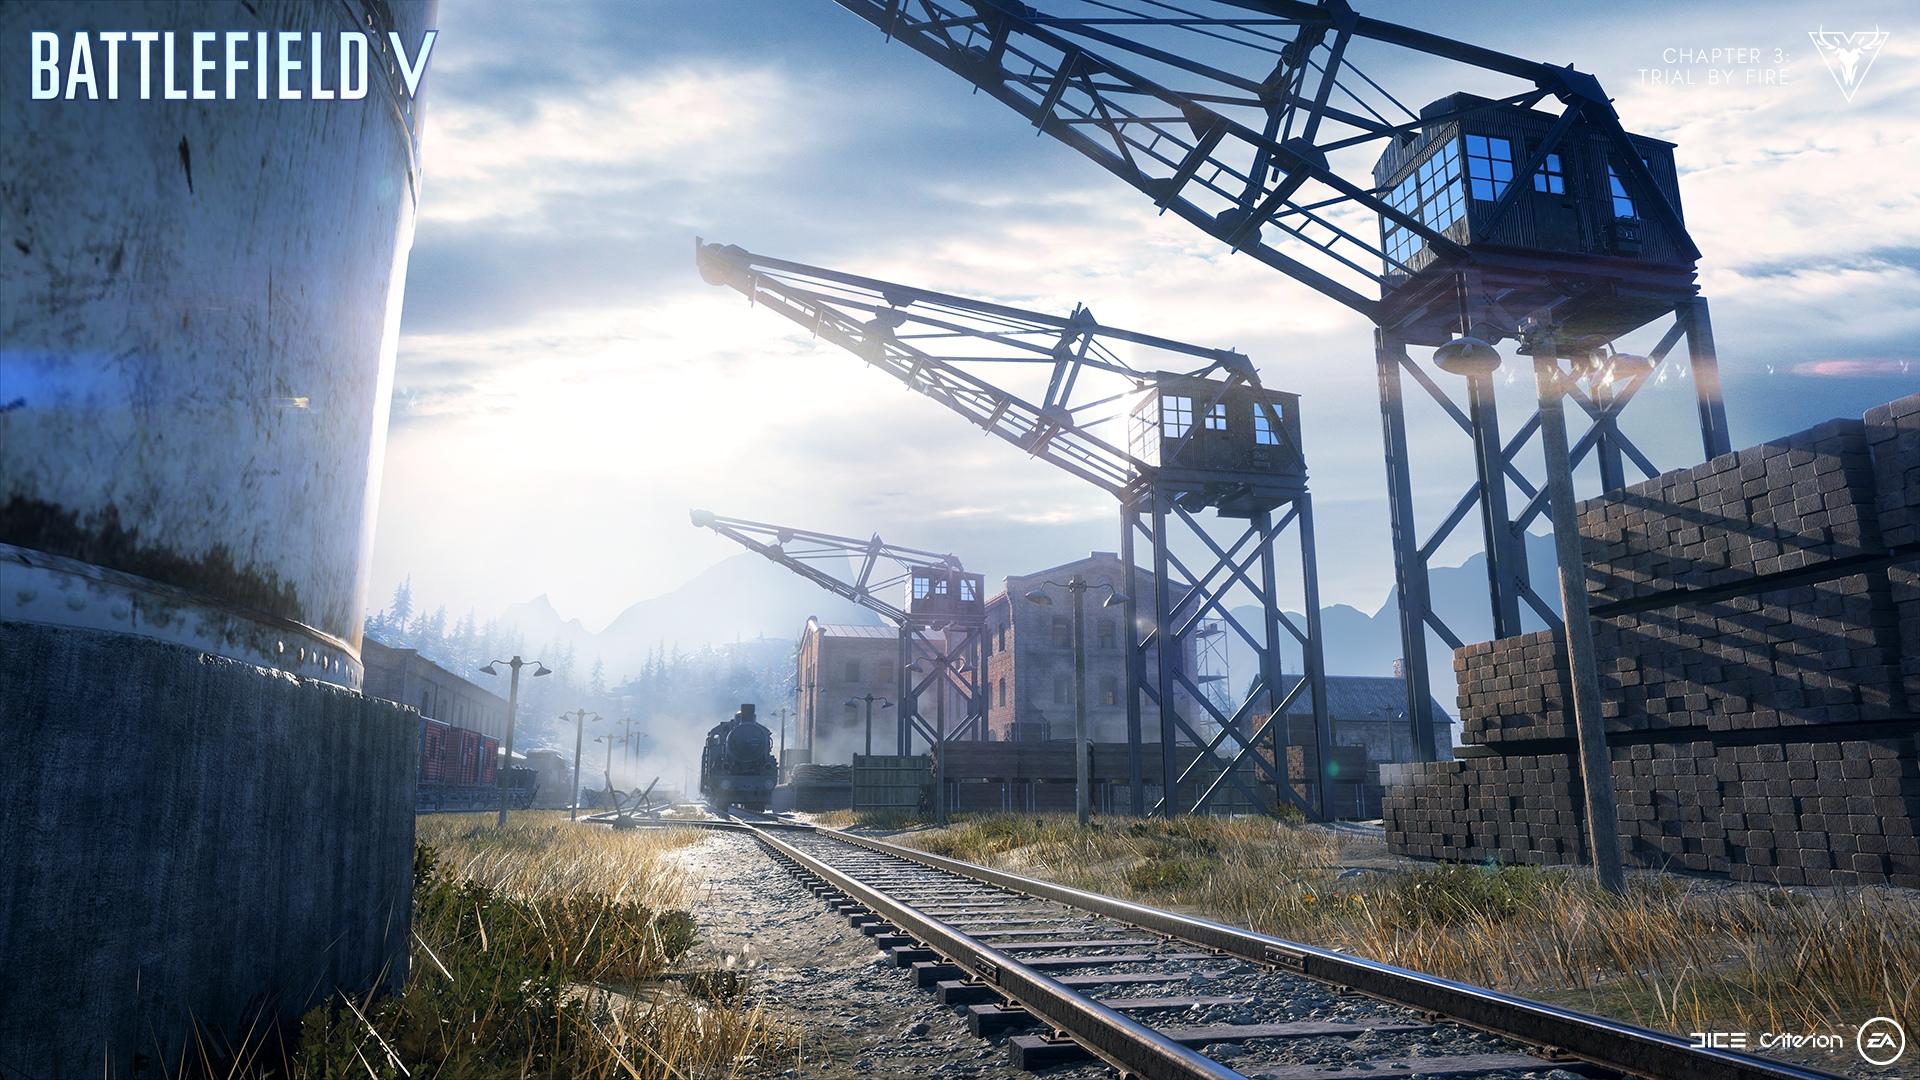 Battlefield 5 Battle Royale Firestorm - New System